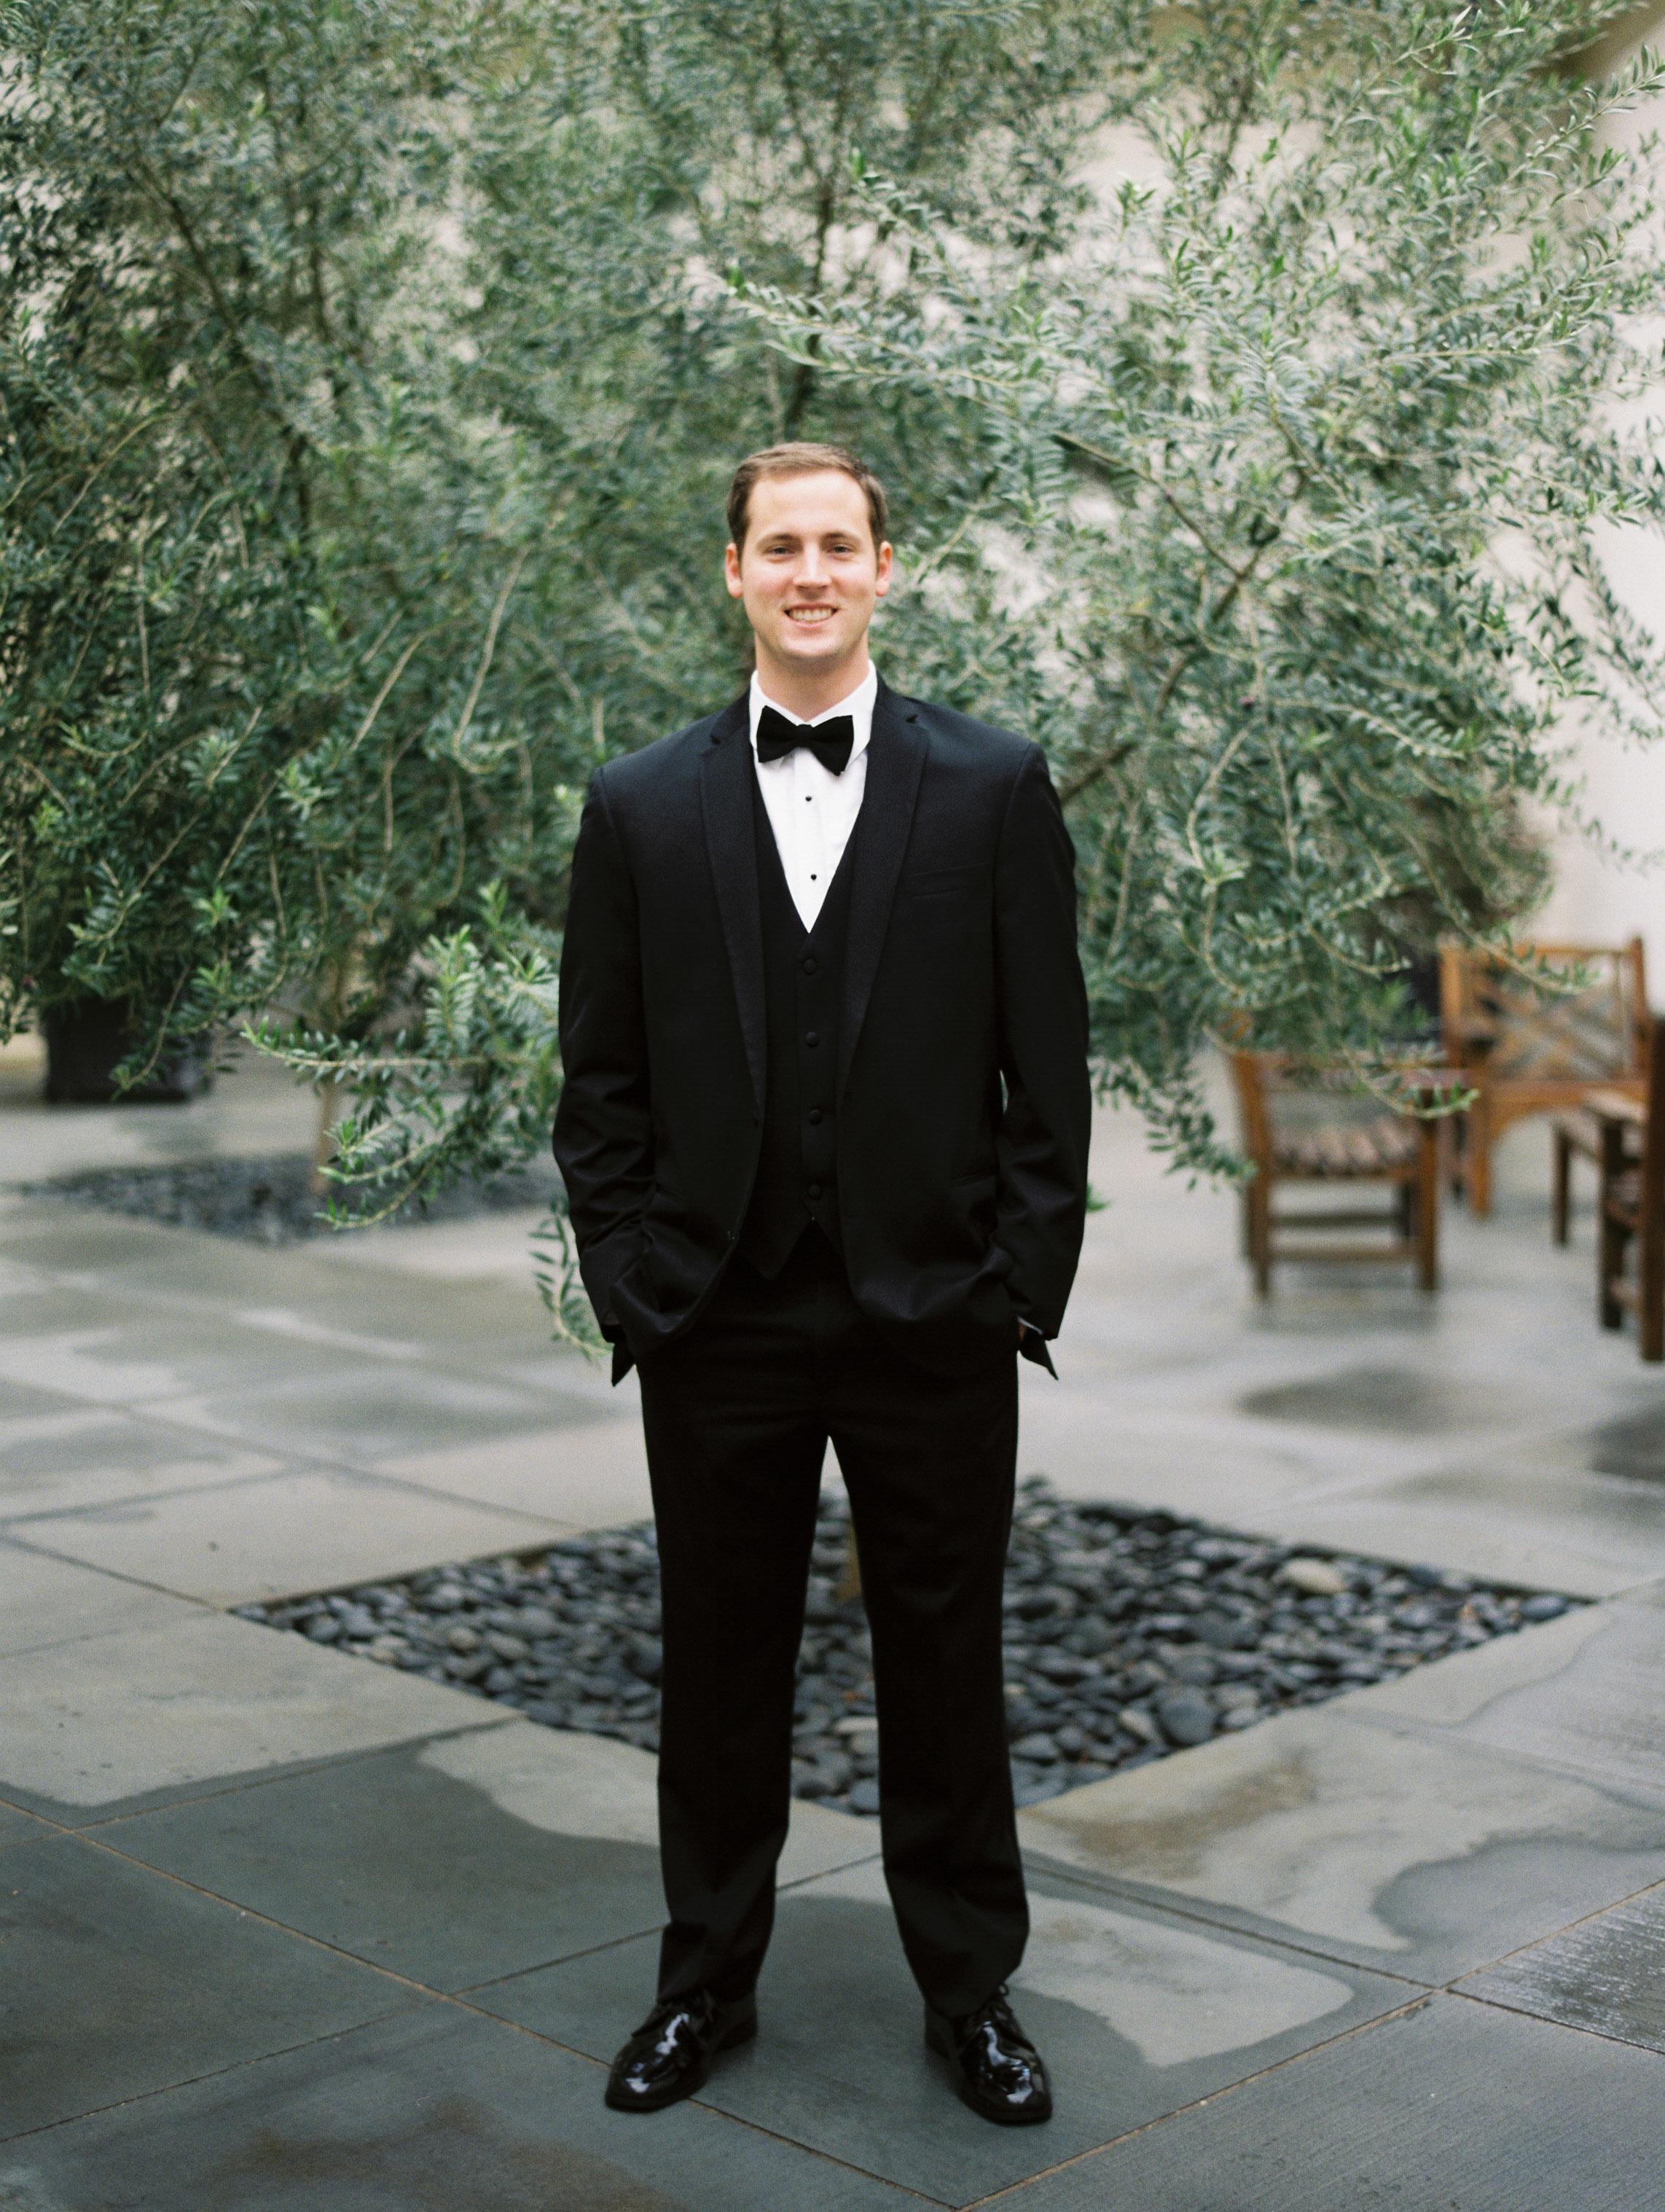 Dana-Fernandez-Photography-Weddings-in-Houston-Magazine-feature-Houston-wedding-photographer-film-16.jpg